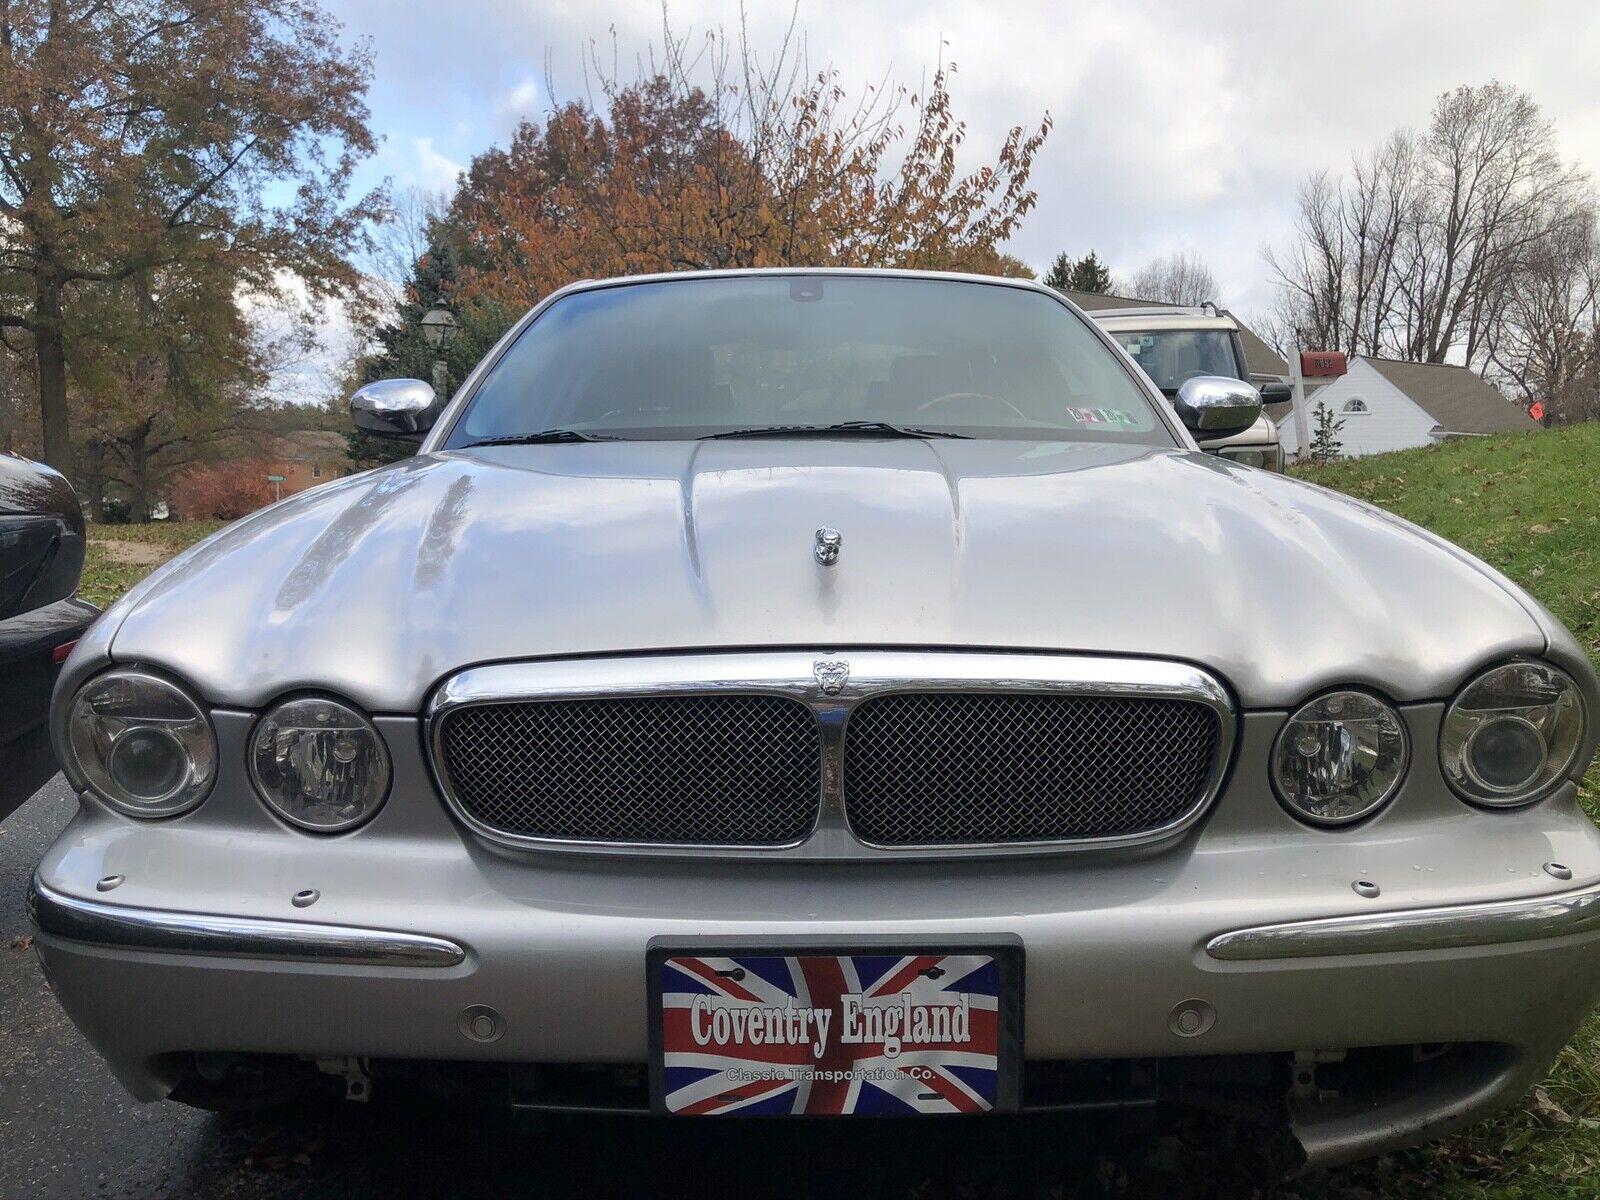 2005 Jaguar Xj Super V8 Vandenplas Xjr X350 400 Hp ...